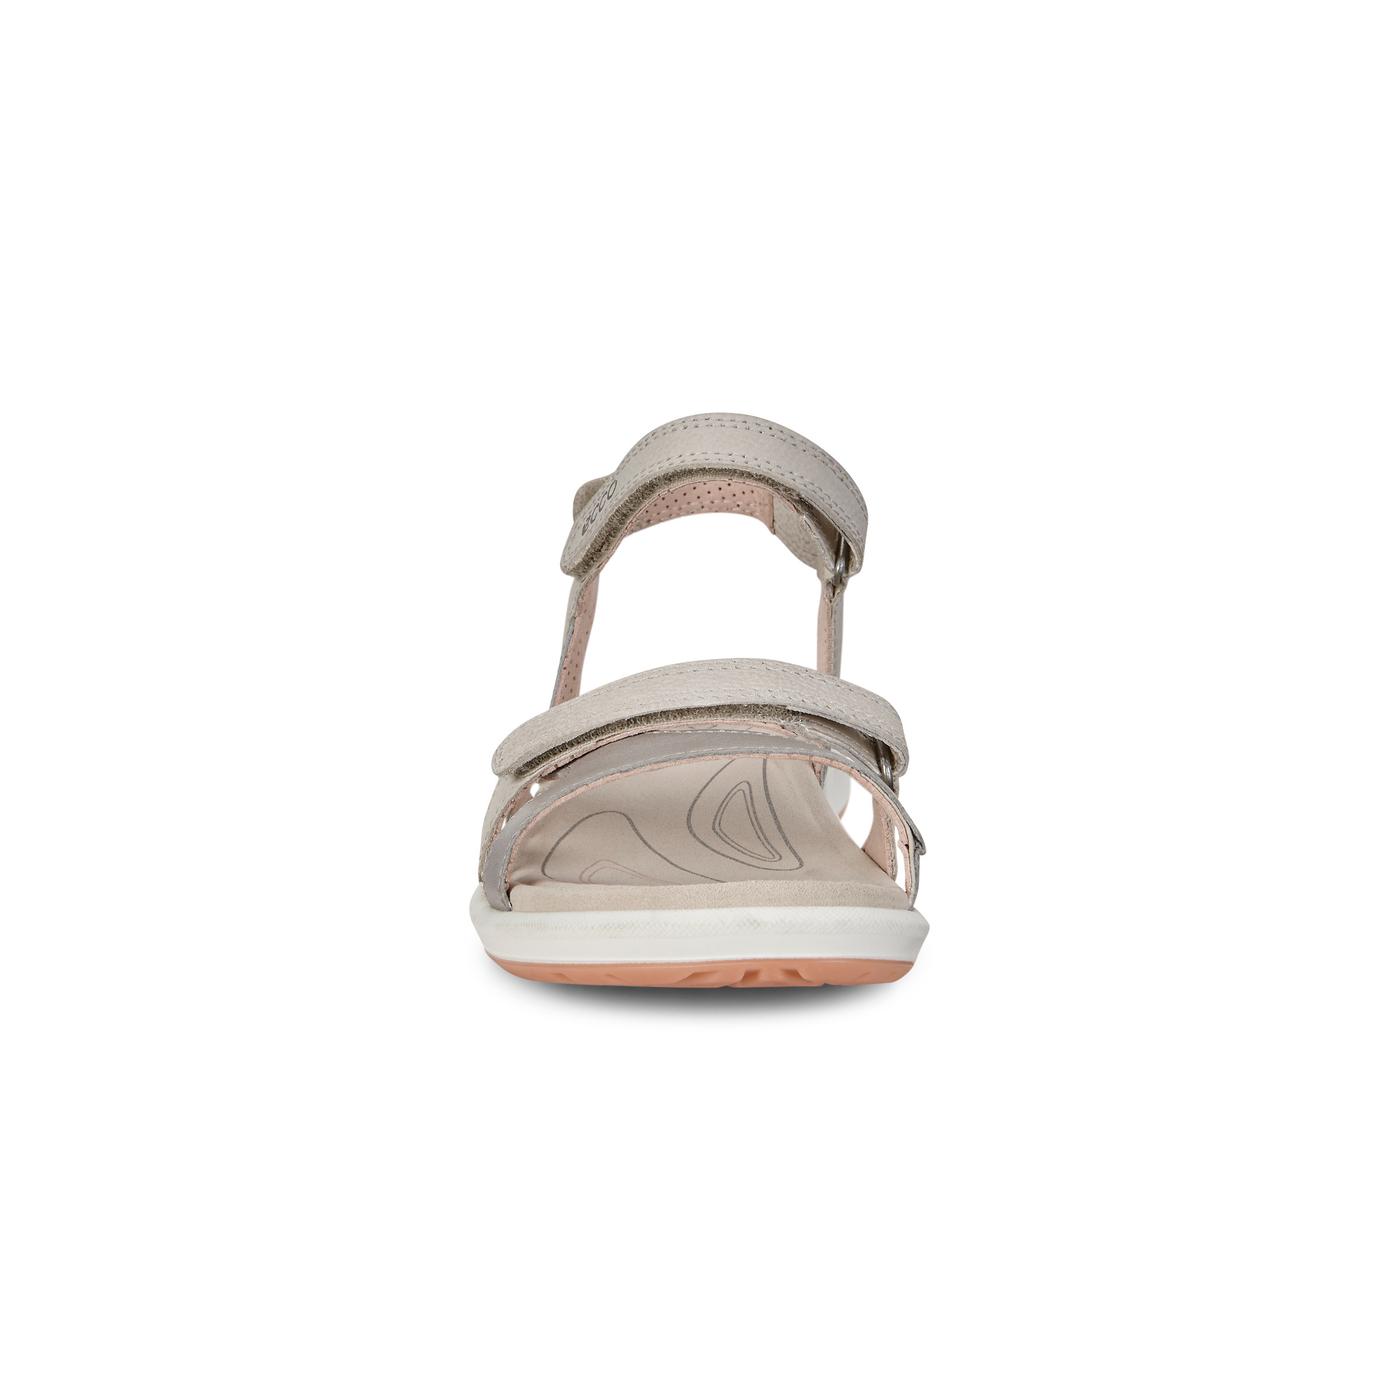 ECCO CRUISE II Ladies Sports Sandal